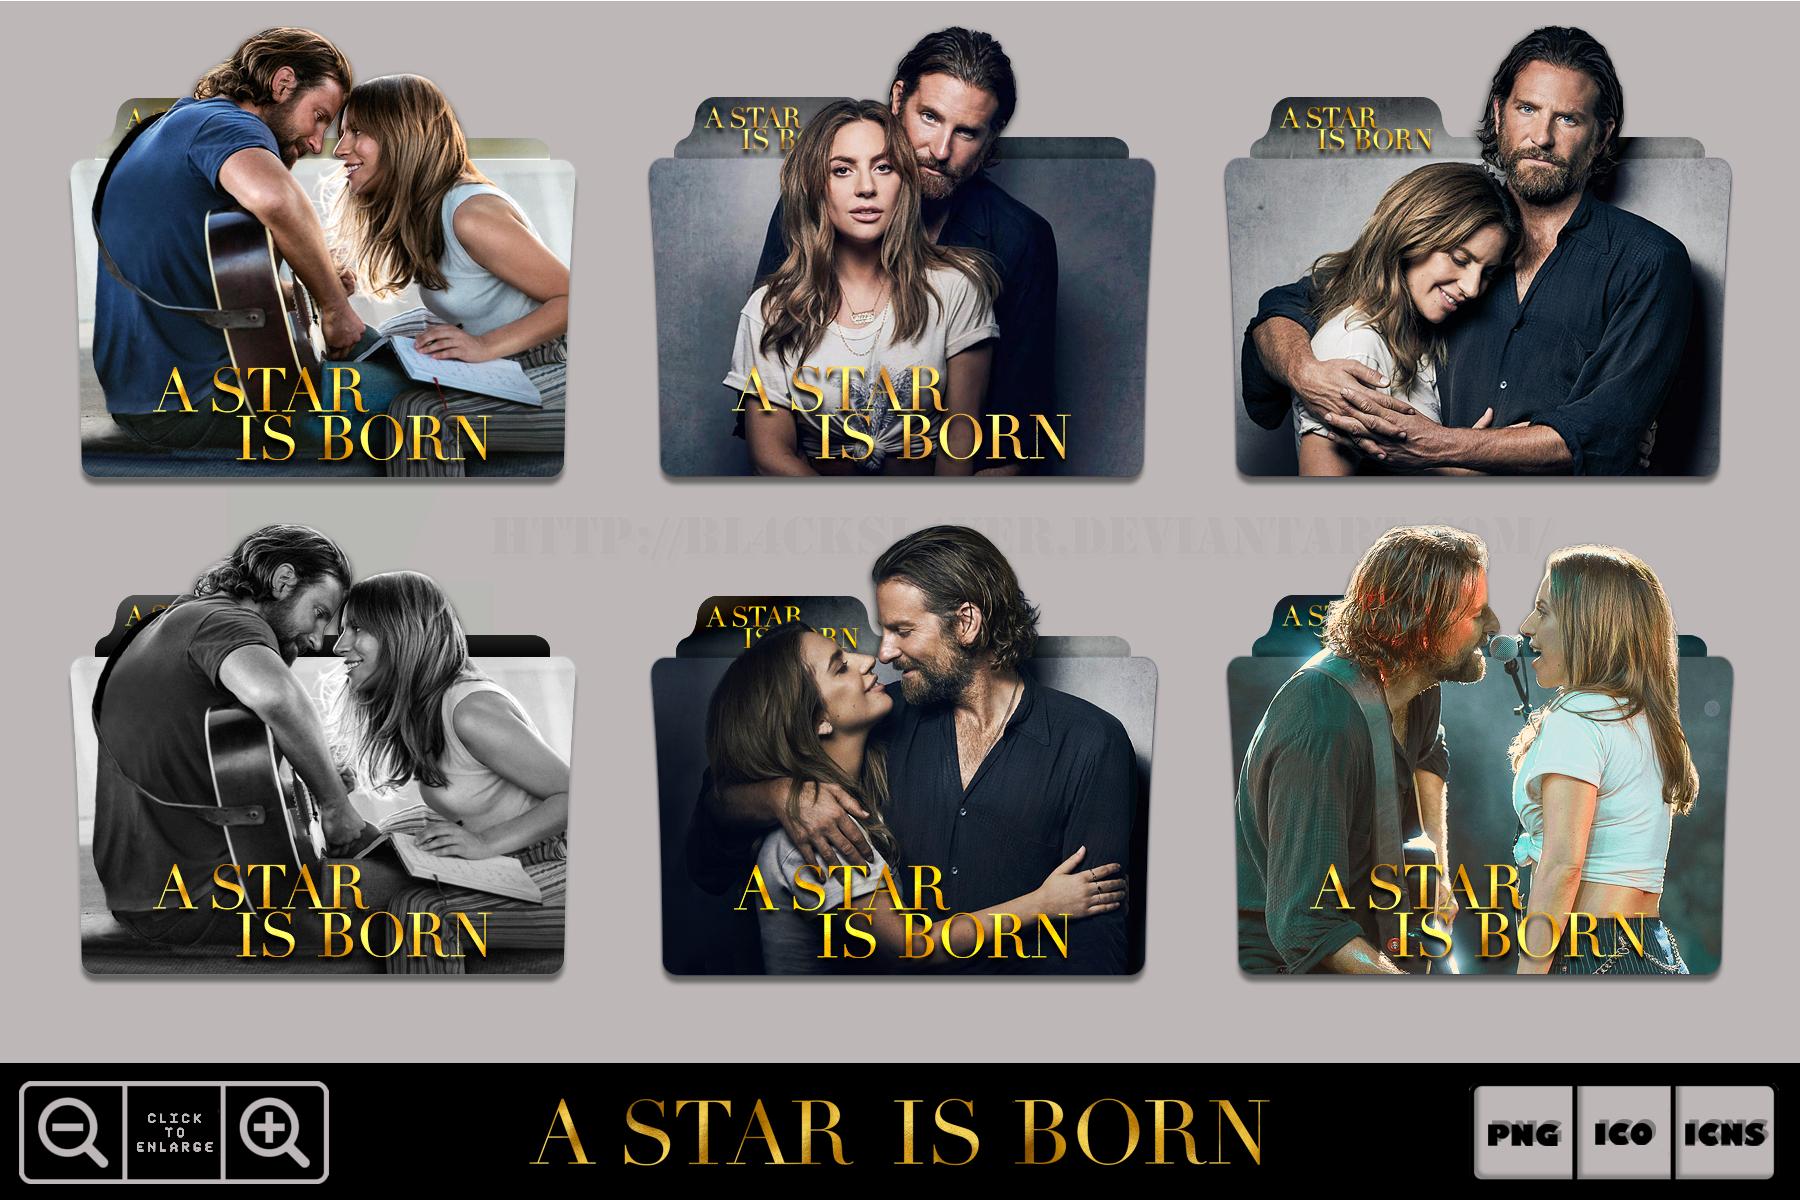 A Star Is Born 2018 Folder Icon Pack By Bl4cksl4yer On Deviantart